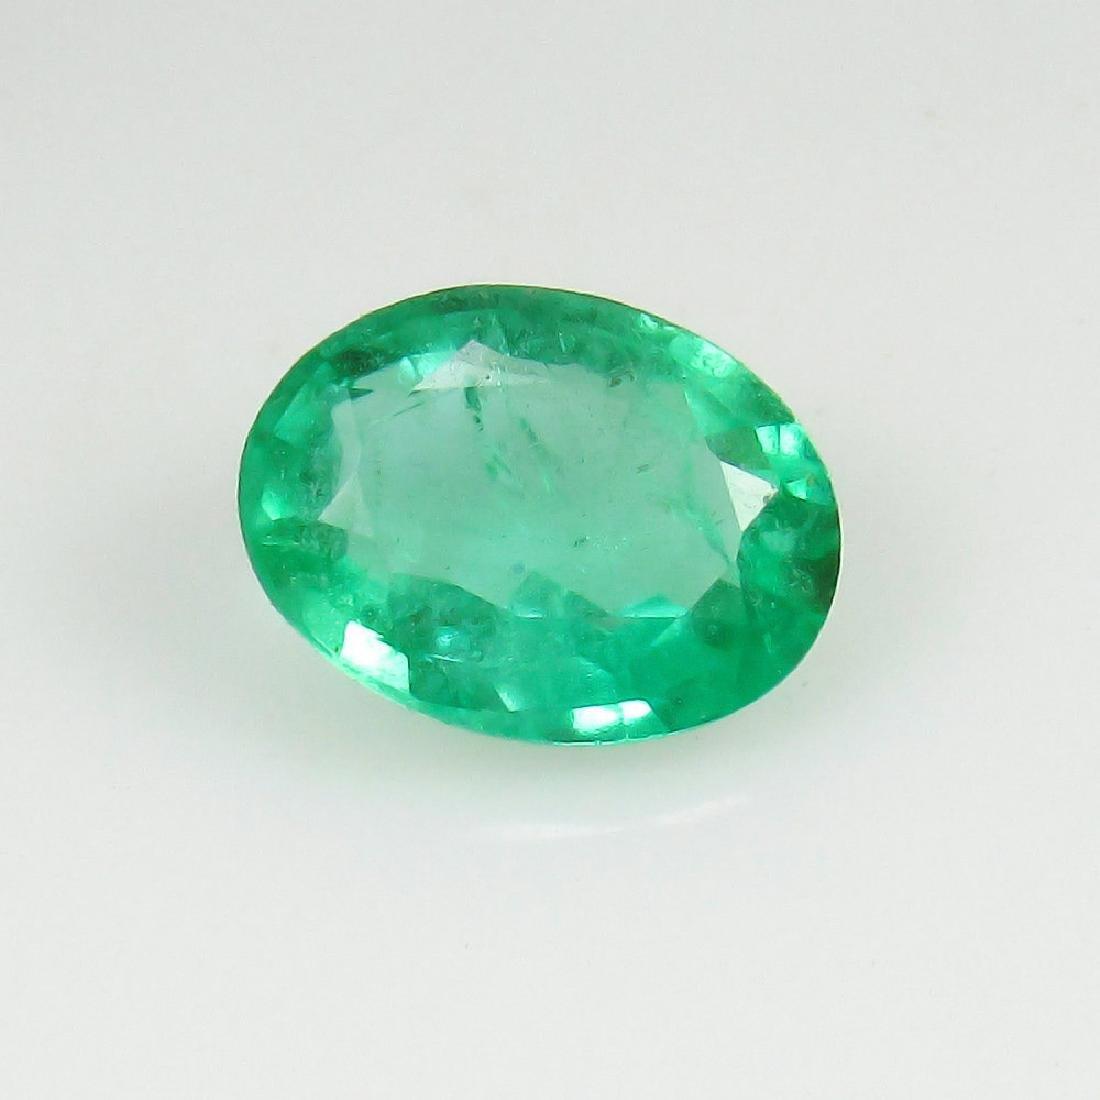 1.23 Ct Genuine Loose Zambian Emerald Nice Oval cut Top - 2